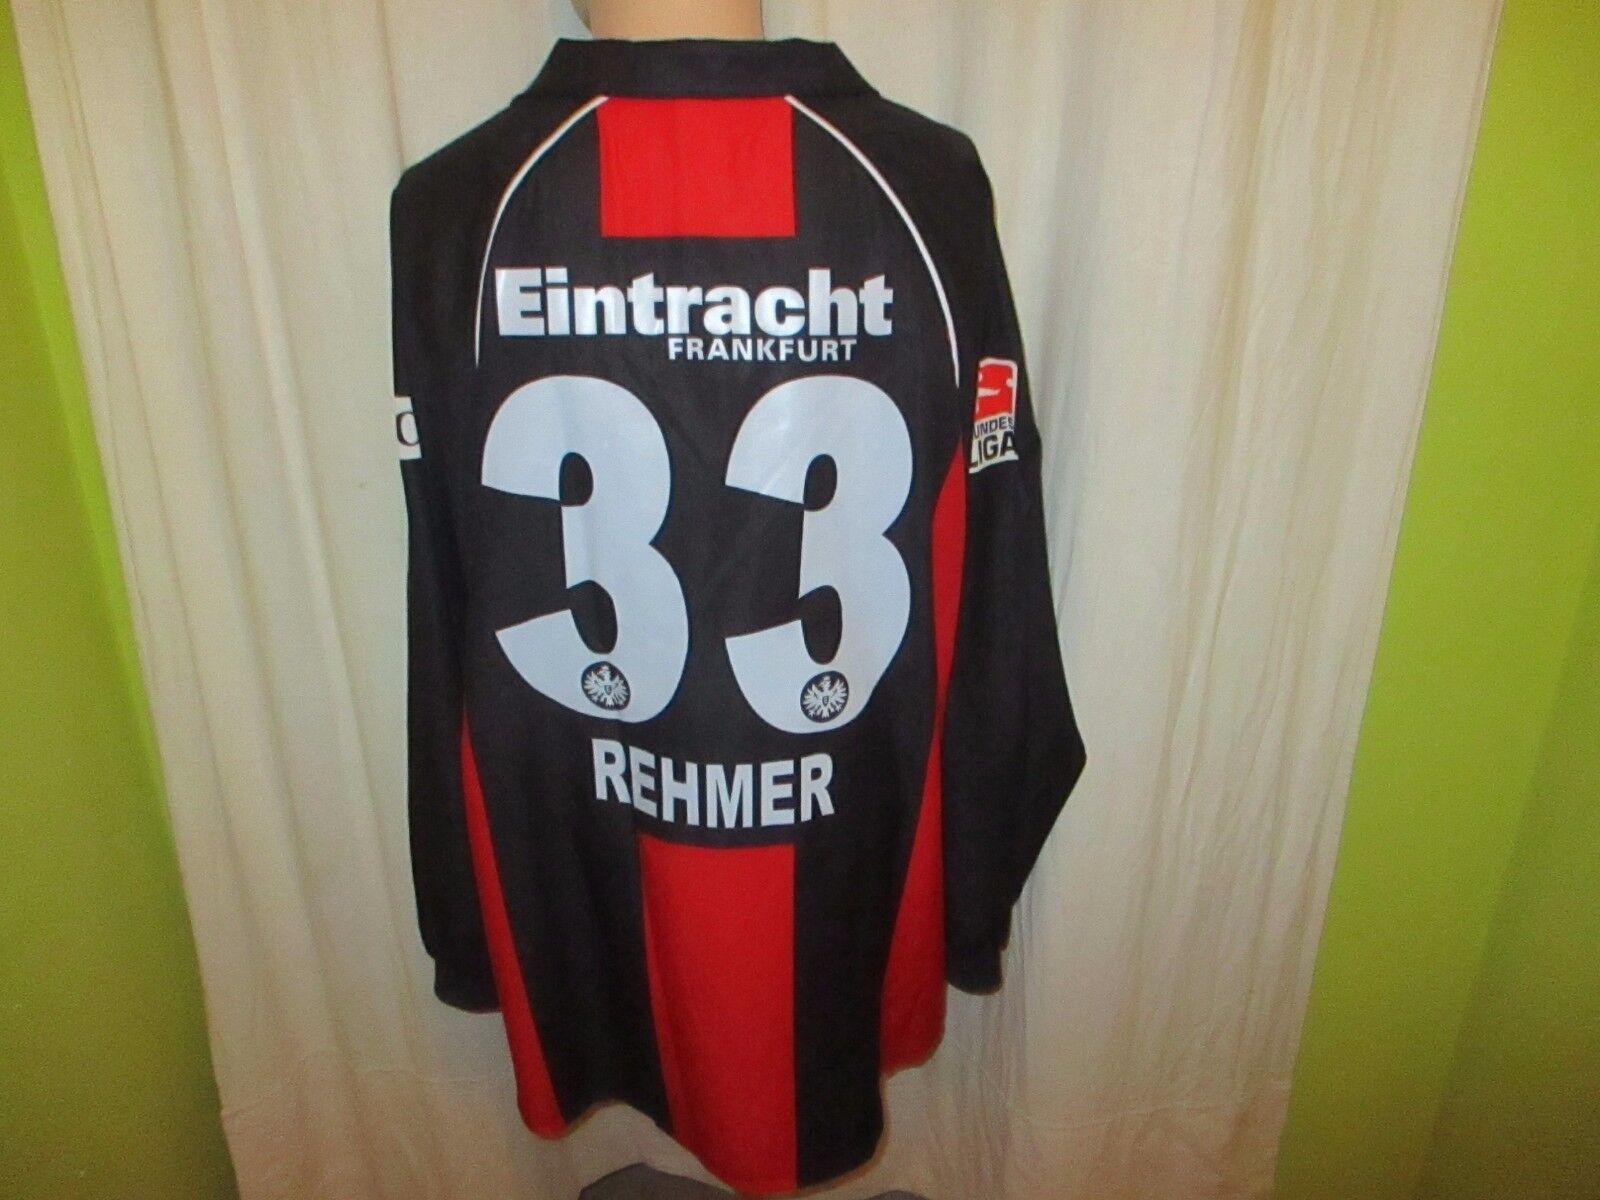 Eintracht Frankfurt Jako Langarm Matchworn + Trikot 2006/07 + Matchworn Nr.33 Rehmer Gr.XL ad1d0f